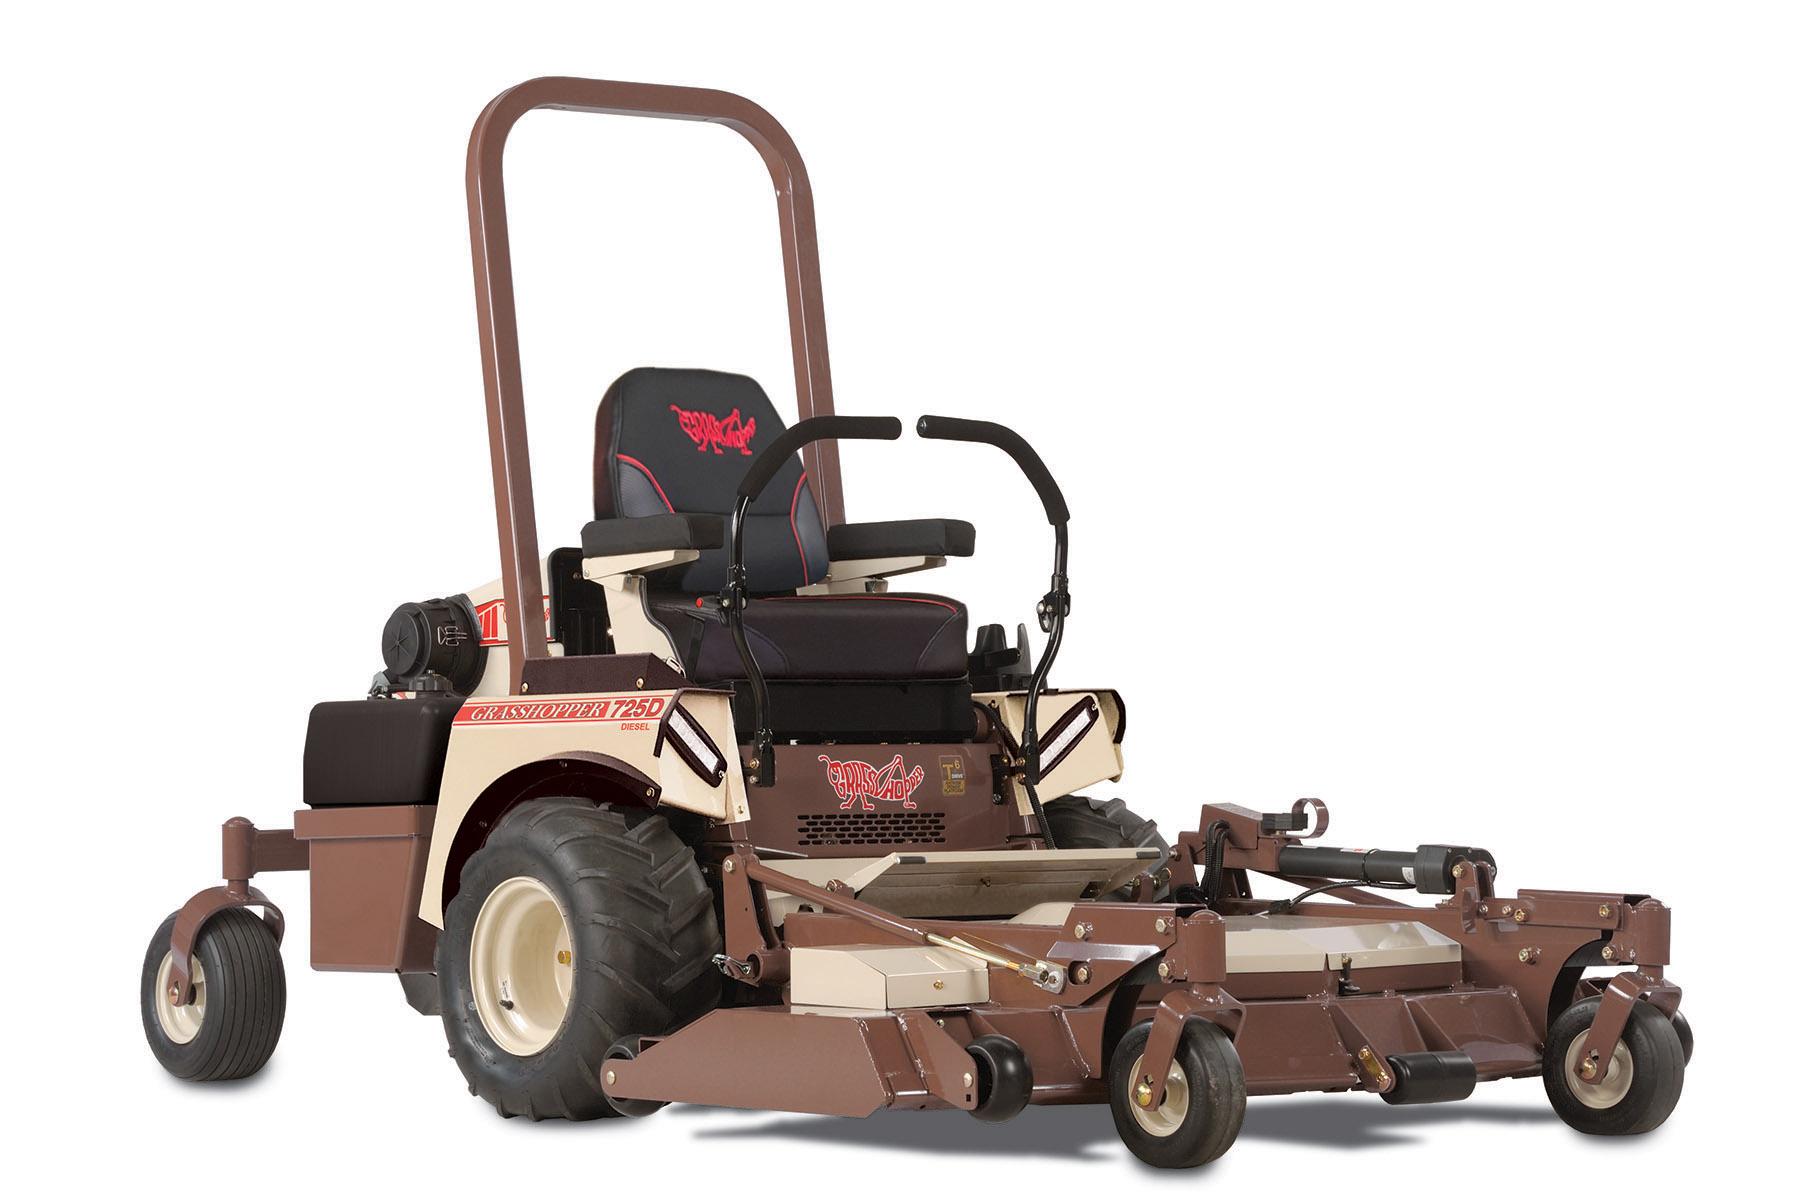 hight resolution of frontmount 725dt grasshopper mowergrasshopper mower wiring harness 6